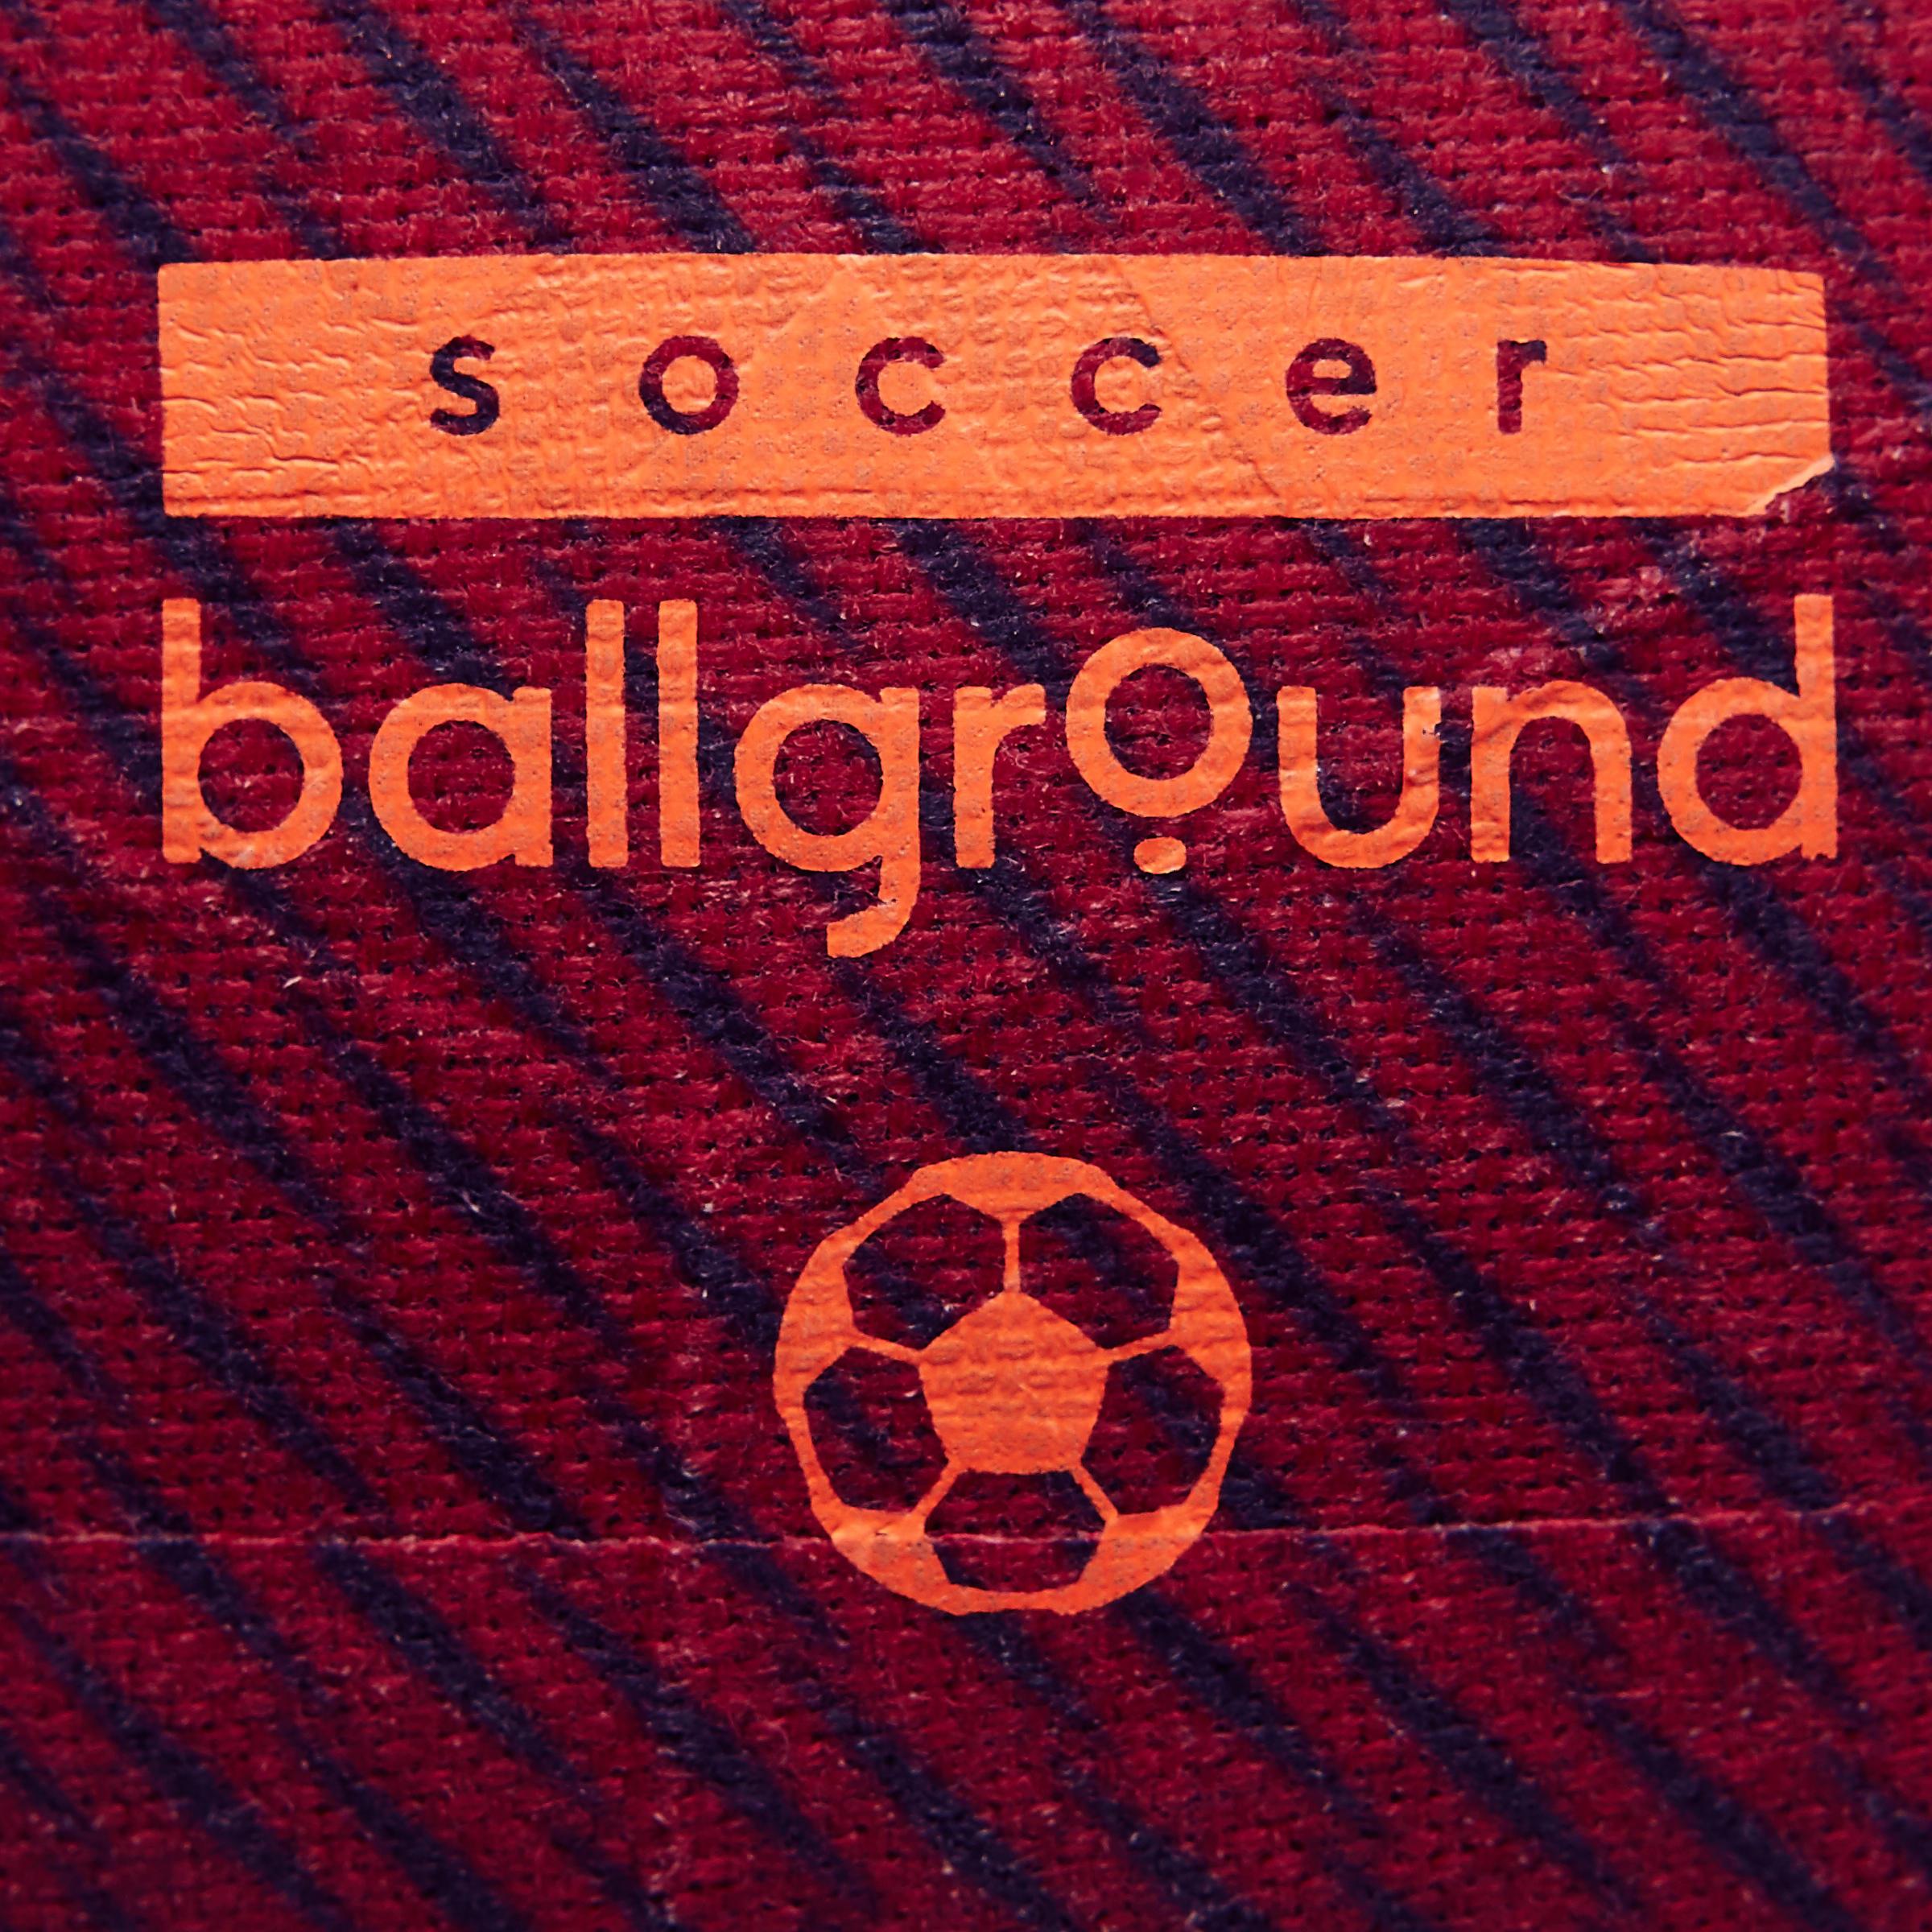 Ballground 100 Football Red